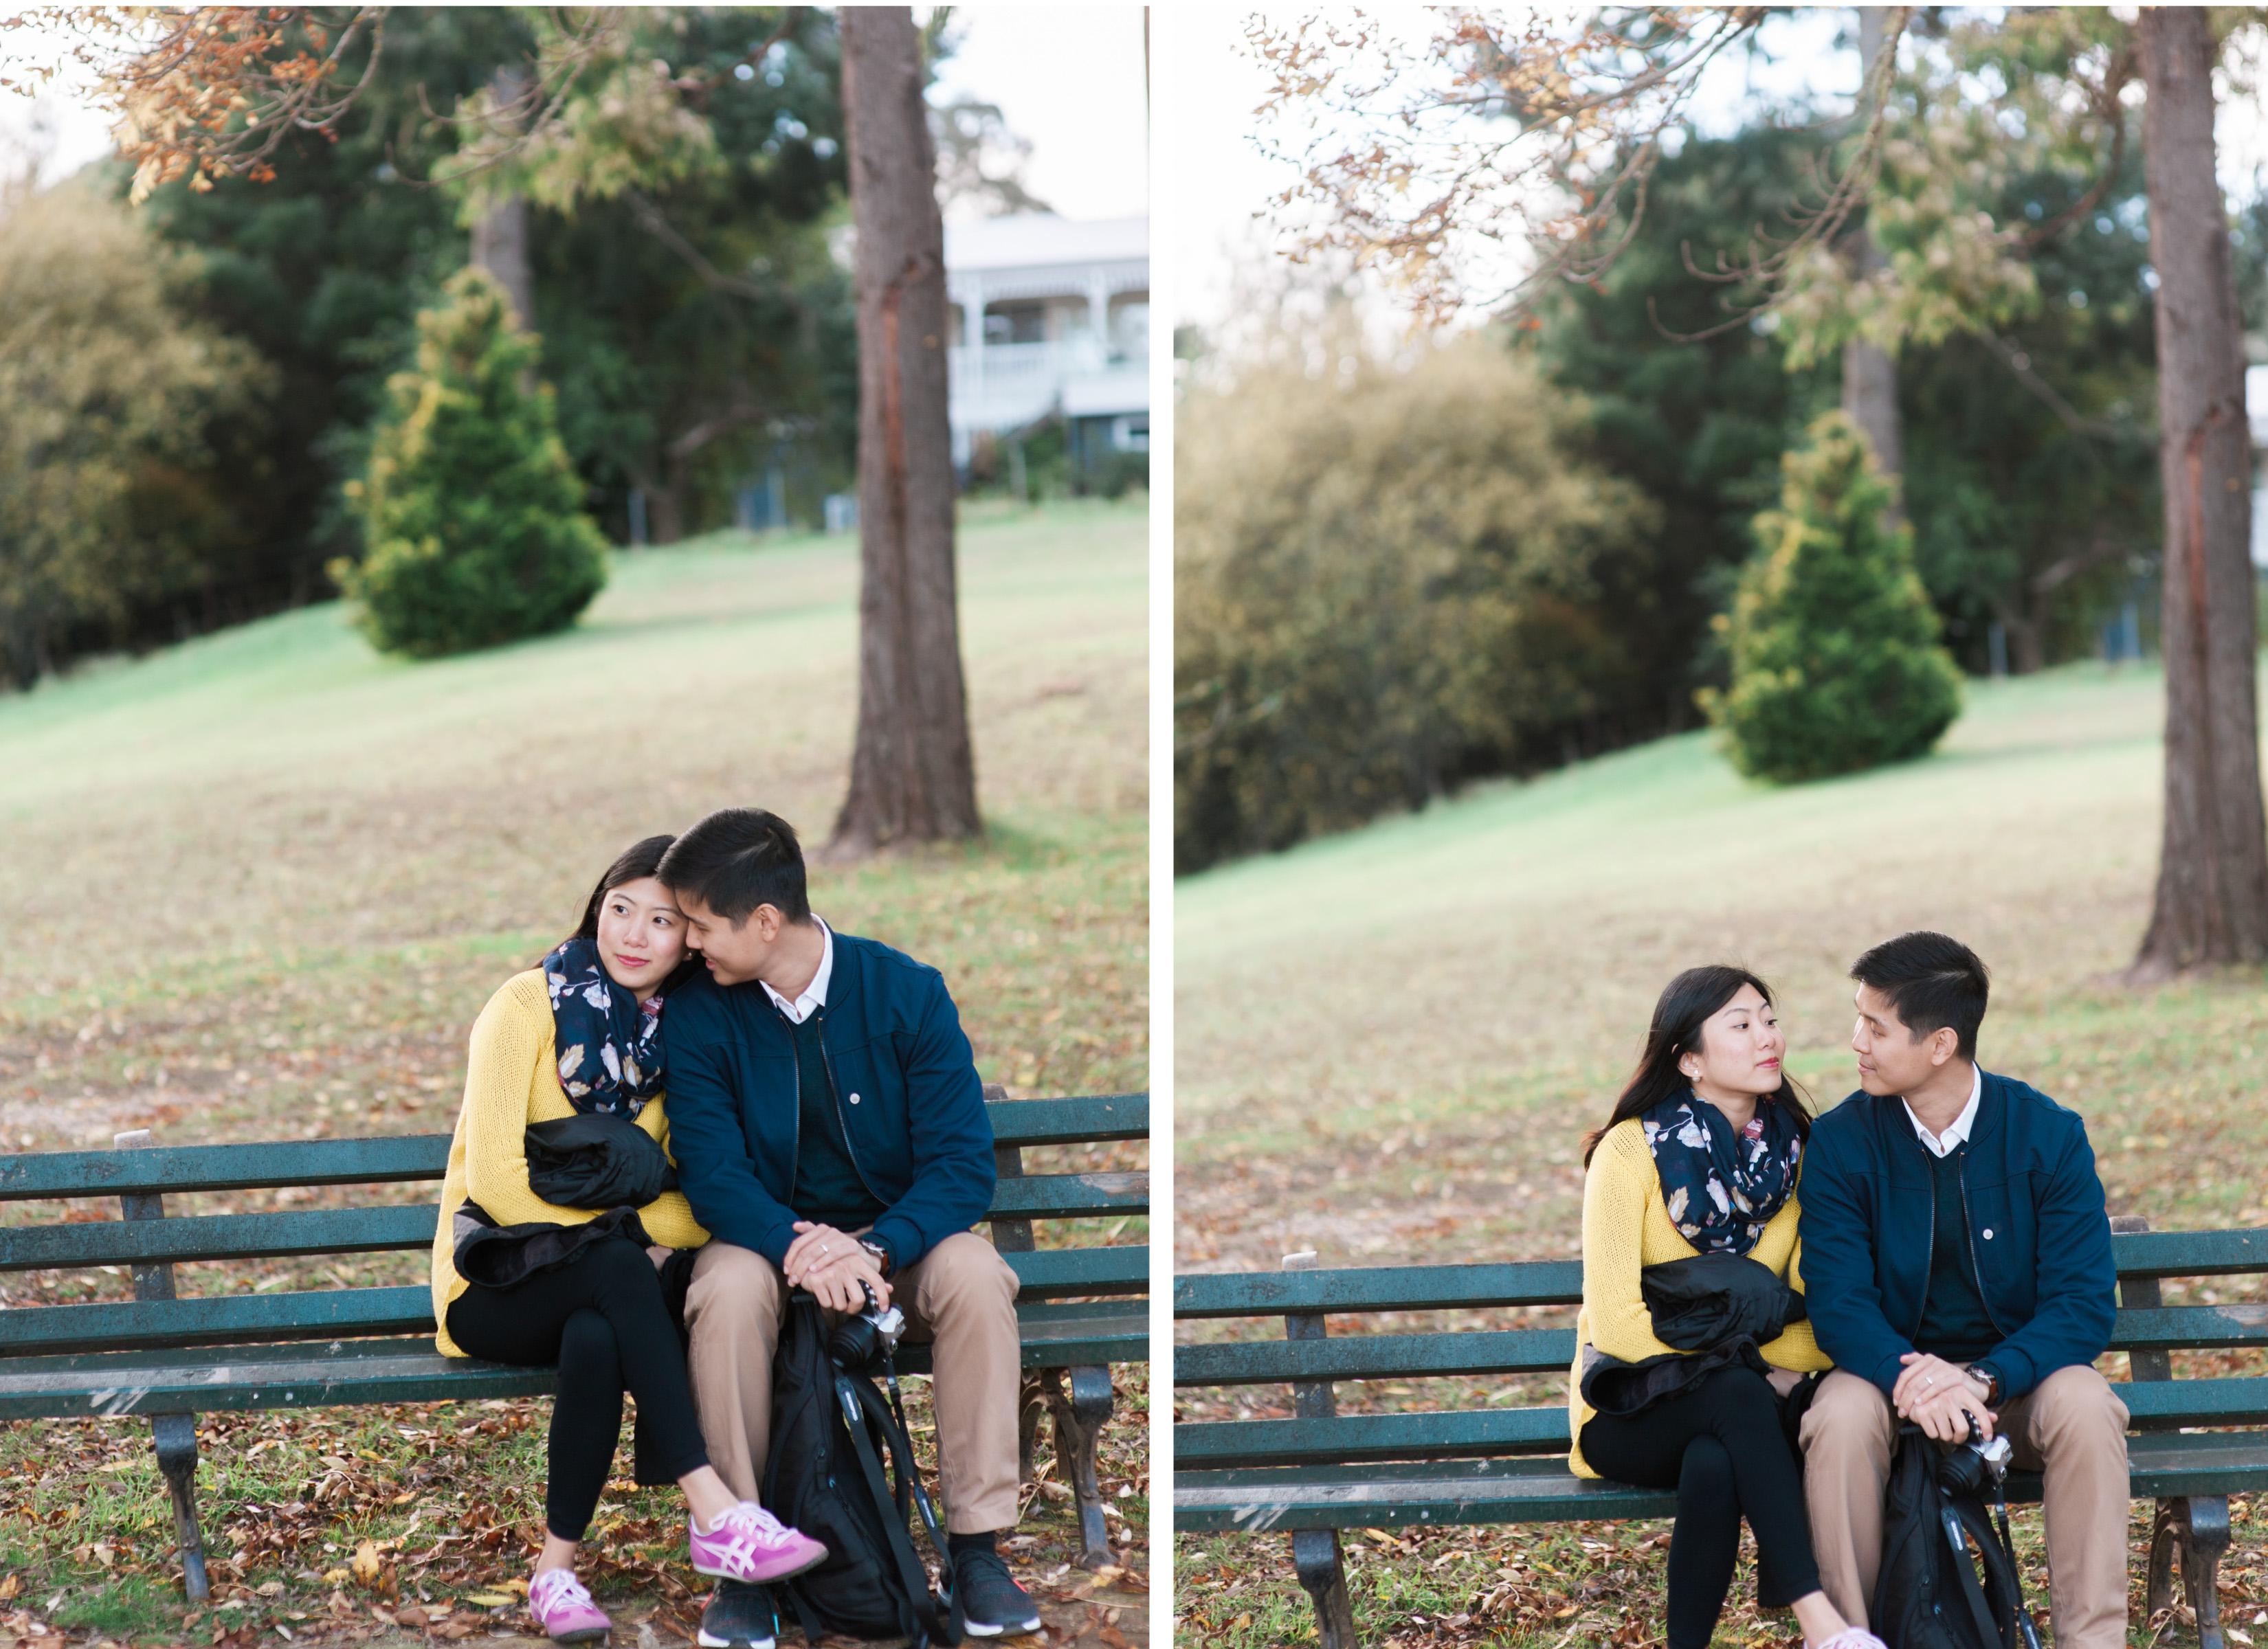 melbourne-australia-pre-wedding-casual-engagement-destination-wedding-autumn-themed-the-wedding-notebook